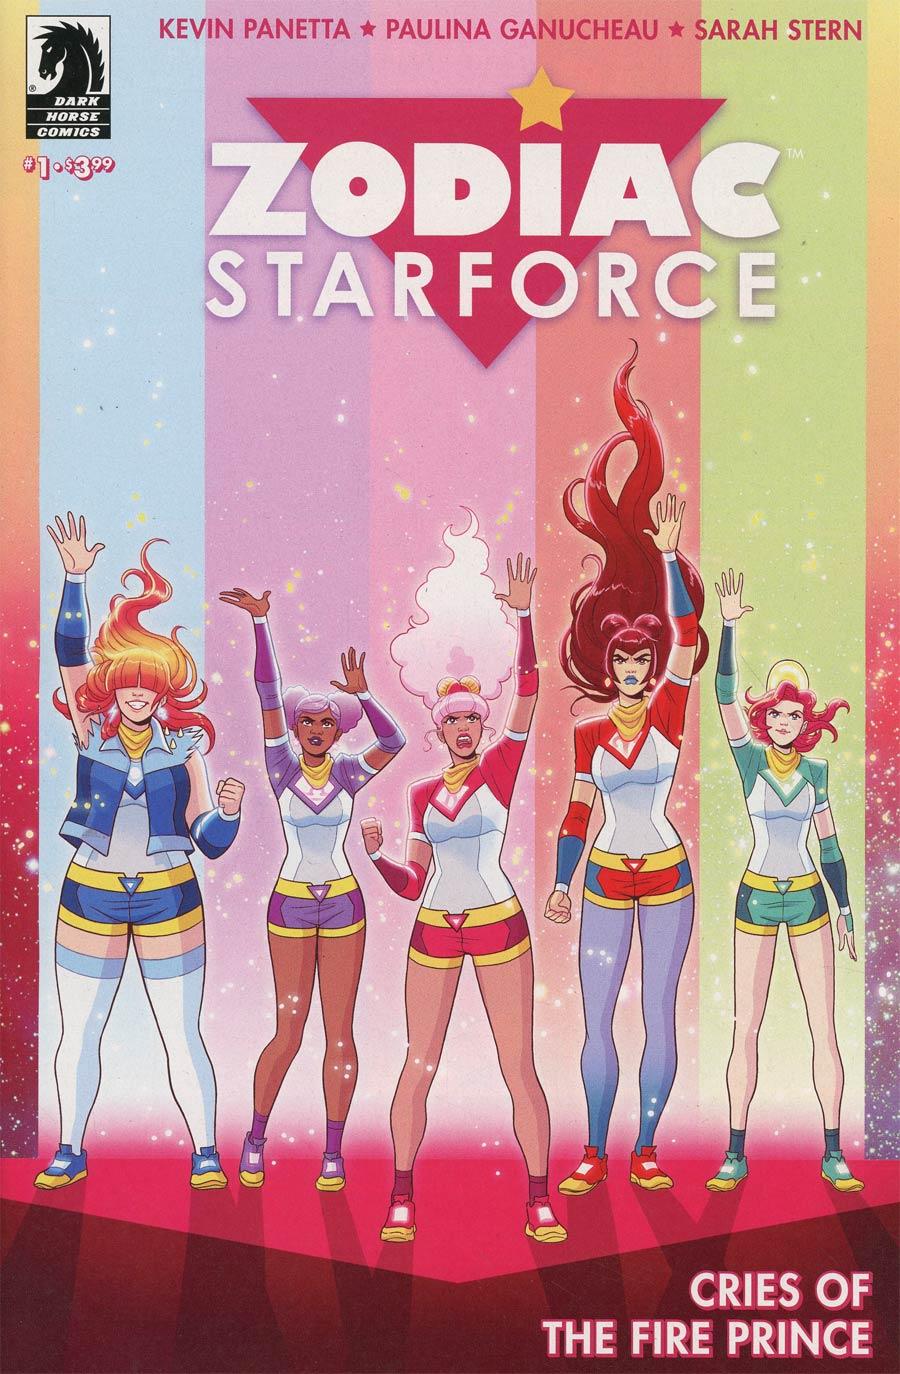 Zodiac Starforce Cries Of The Fire Prince #1 Cover A Regular Paulina Ganucheau Cover